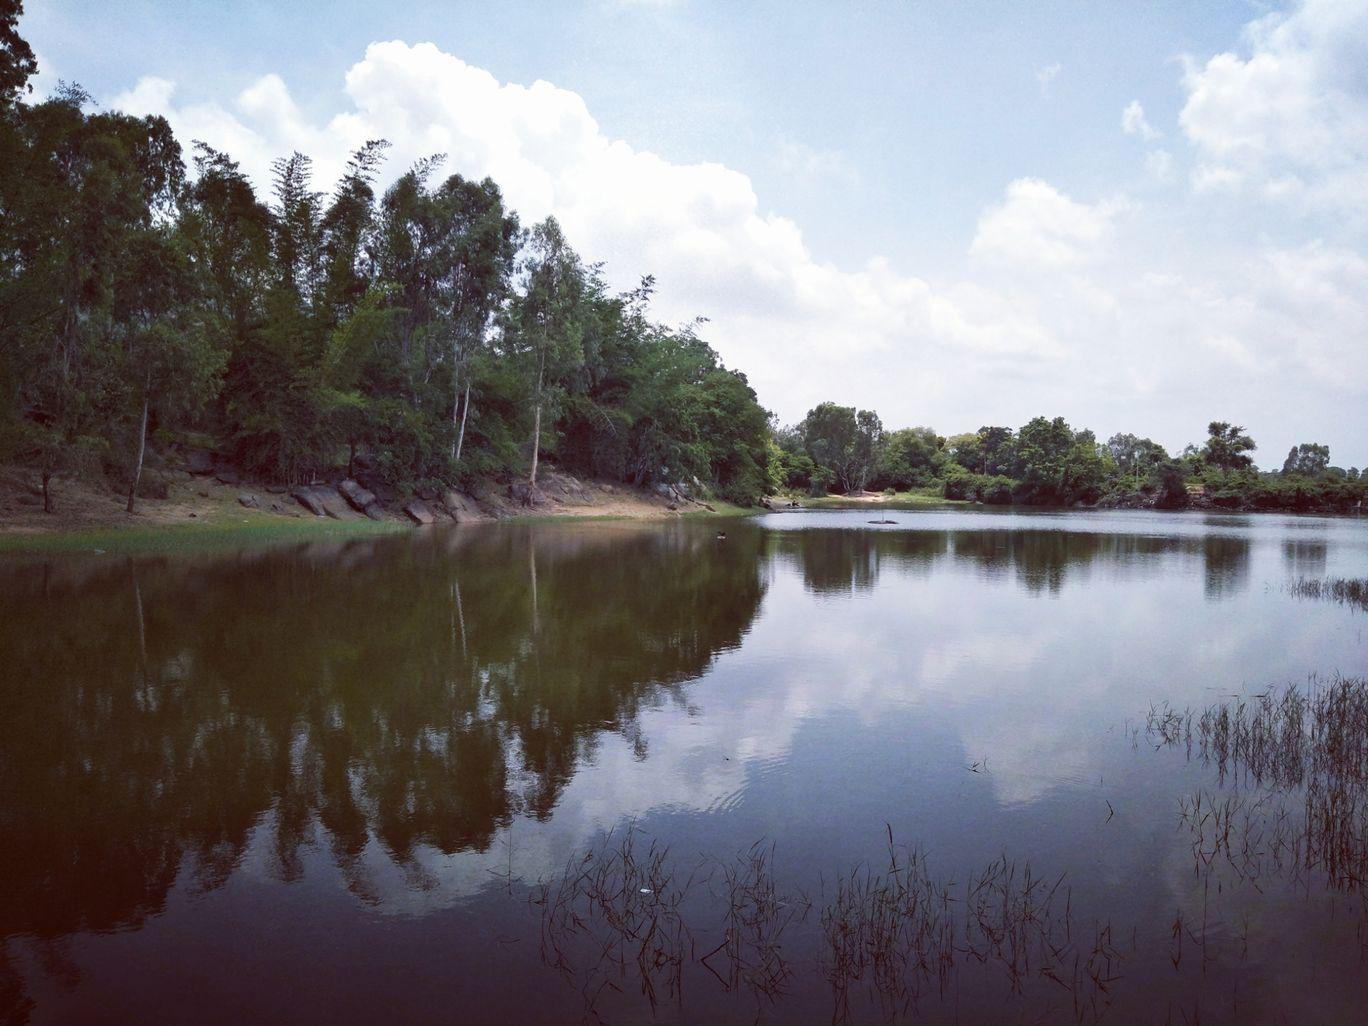 Photo of Devarayanadurga hill By Sunil Kumar